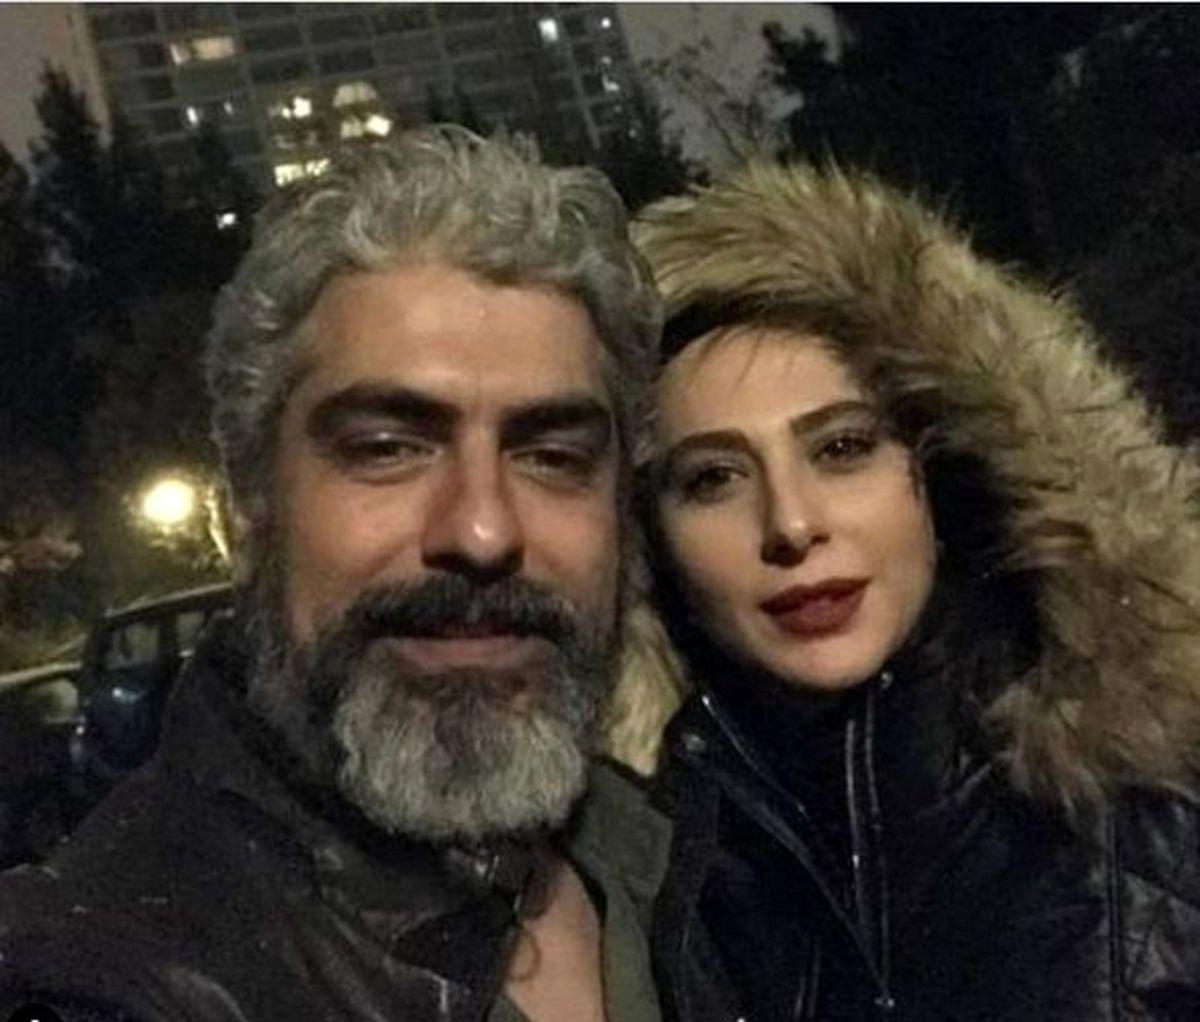 سلفی مهدی پاکدل و همسرش در روز تولدش + عکس